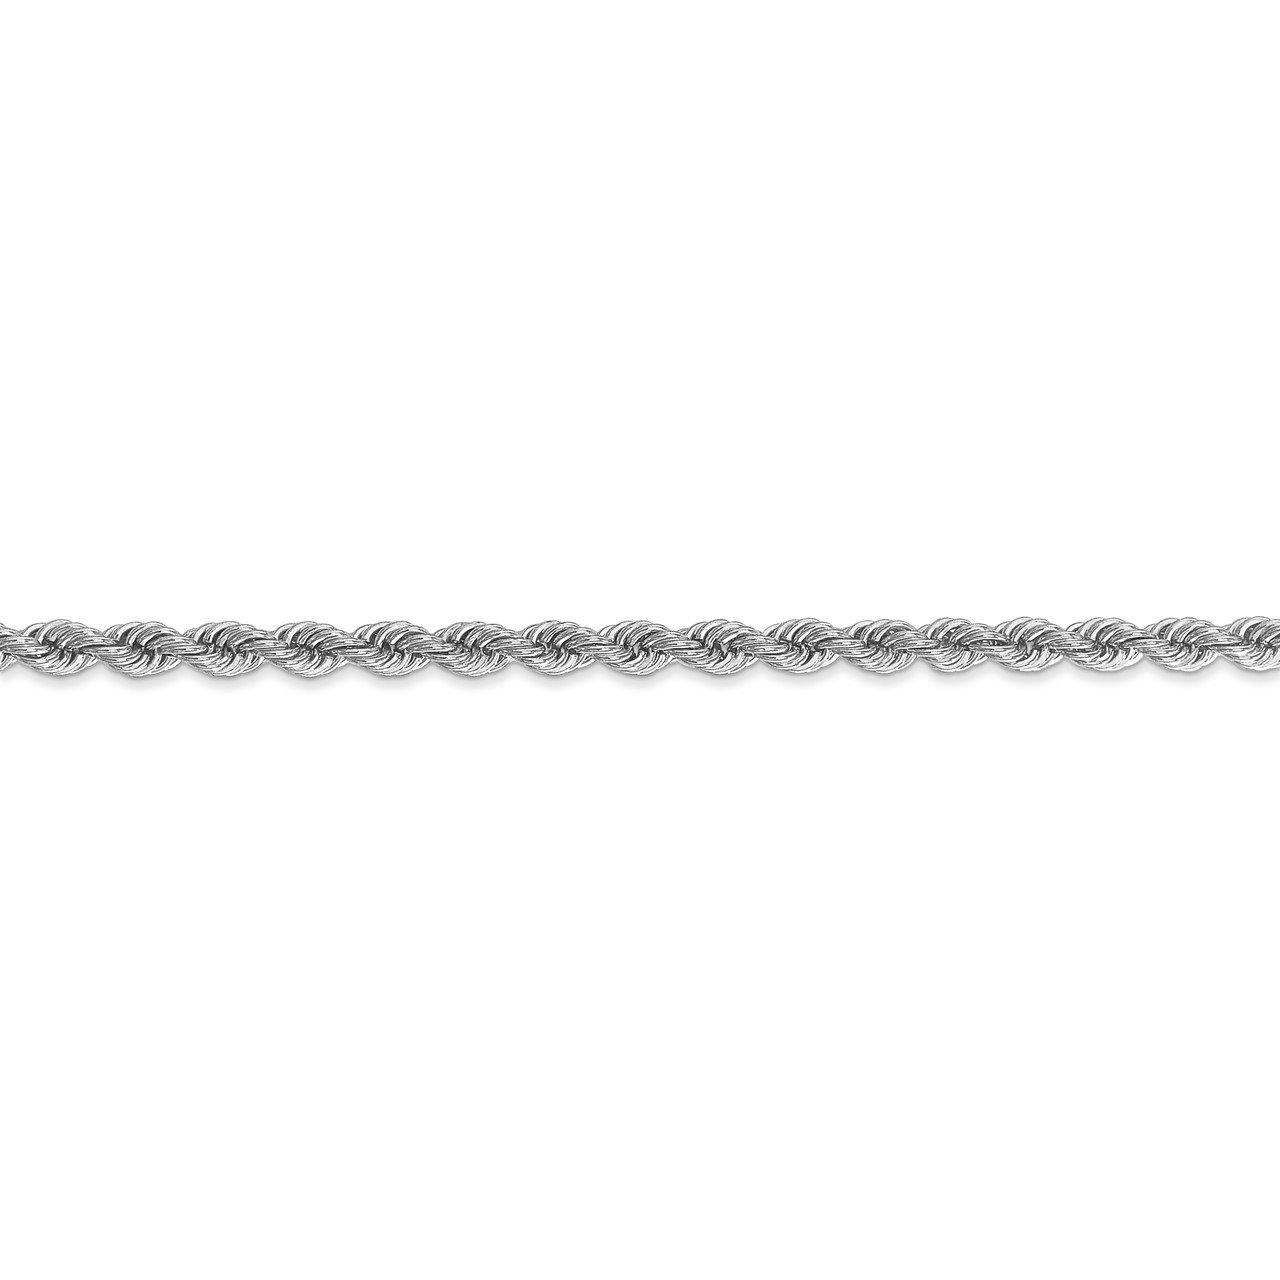 14k WG 3.0mm Regular Rope Chain-2